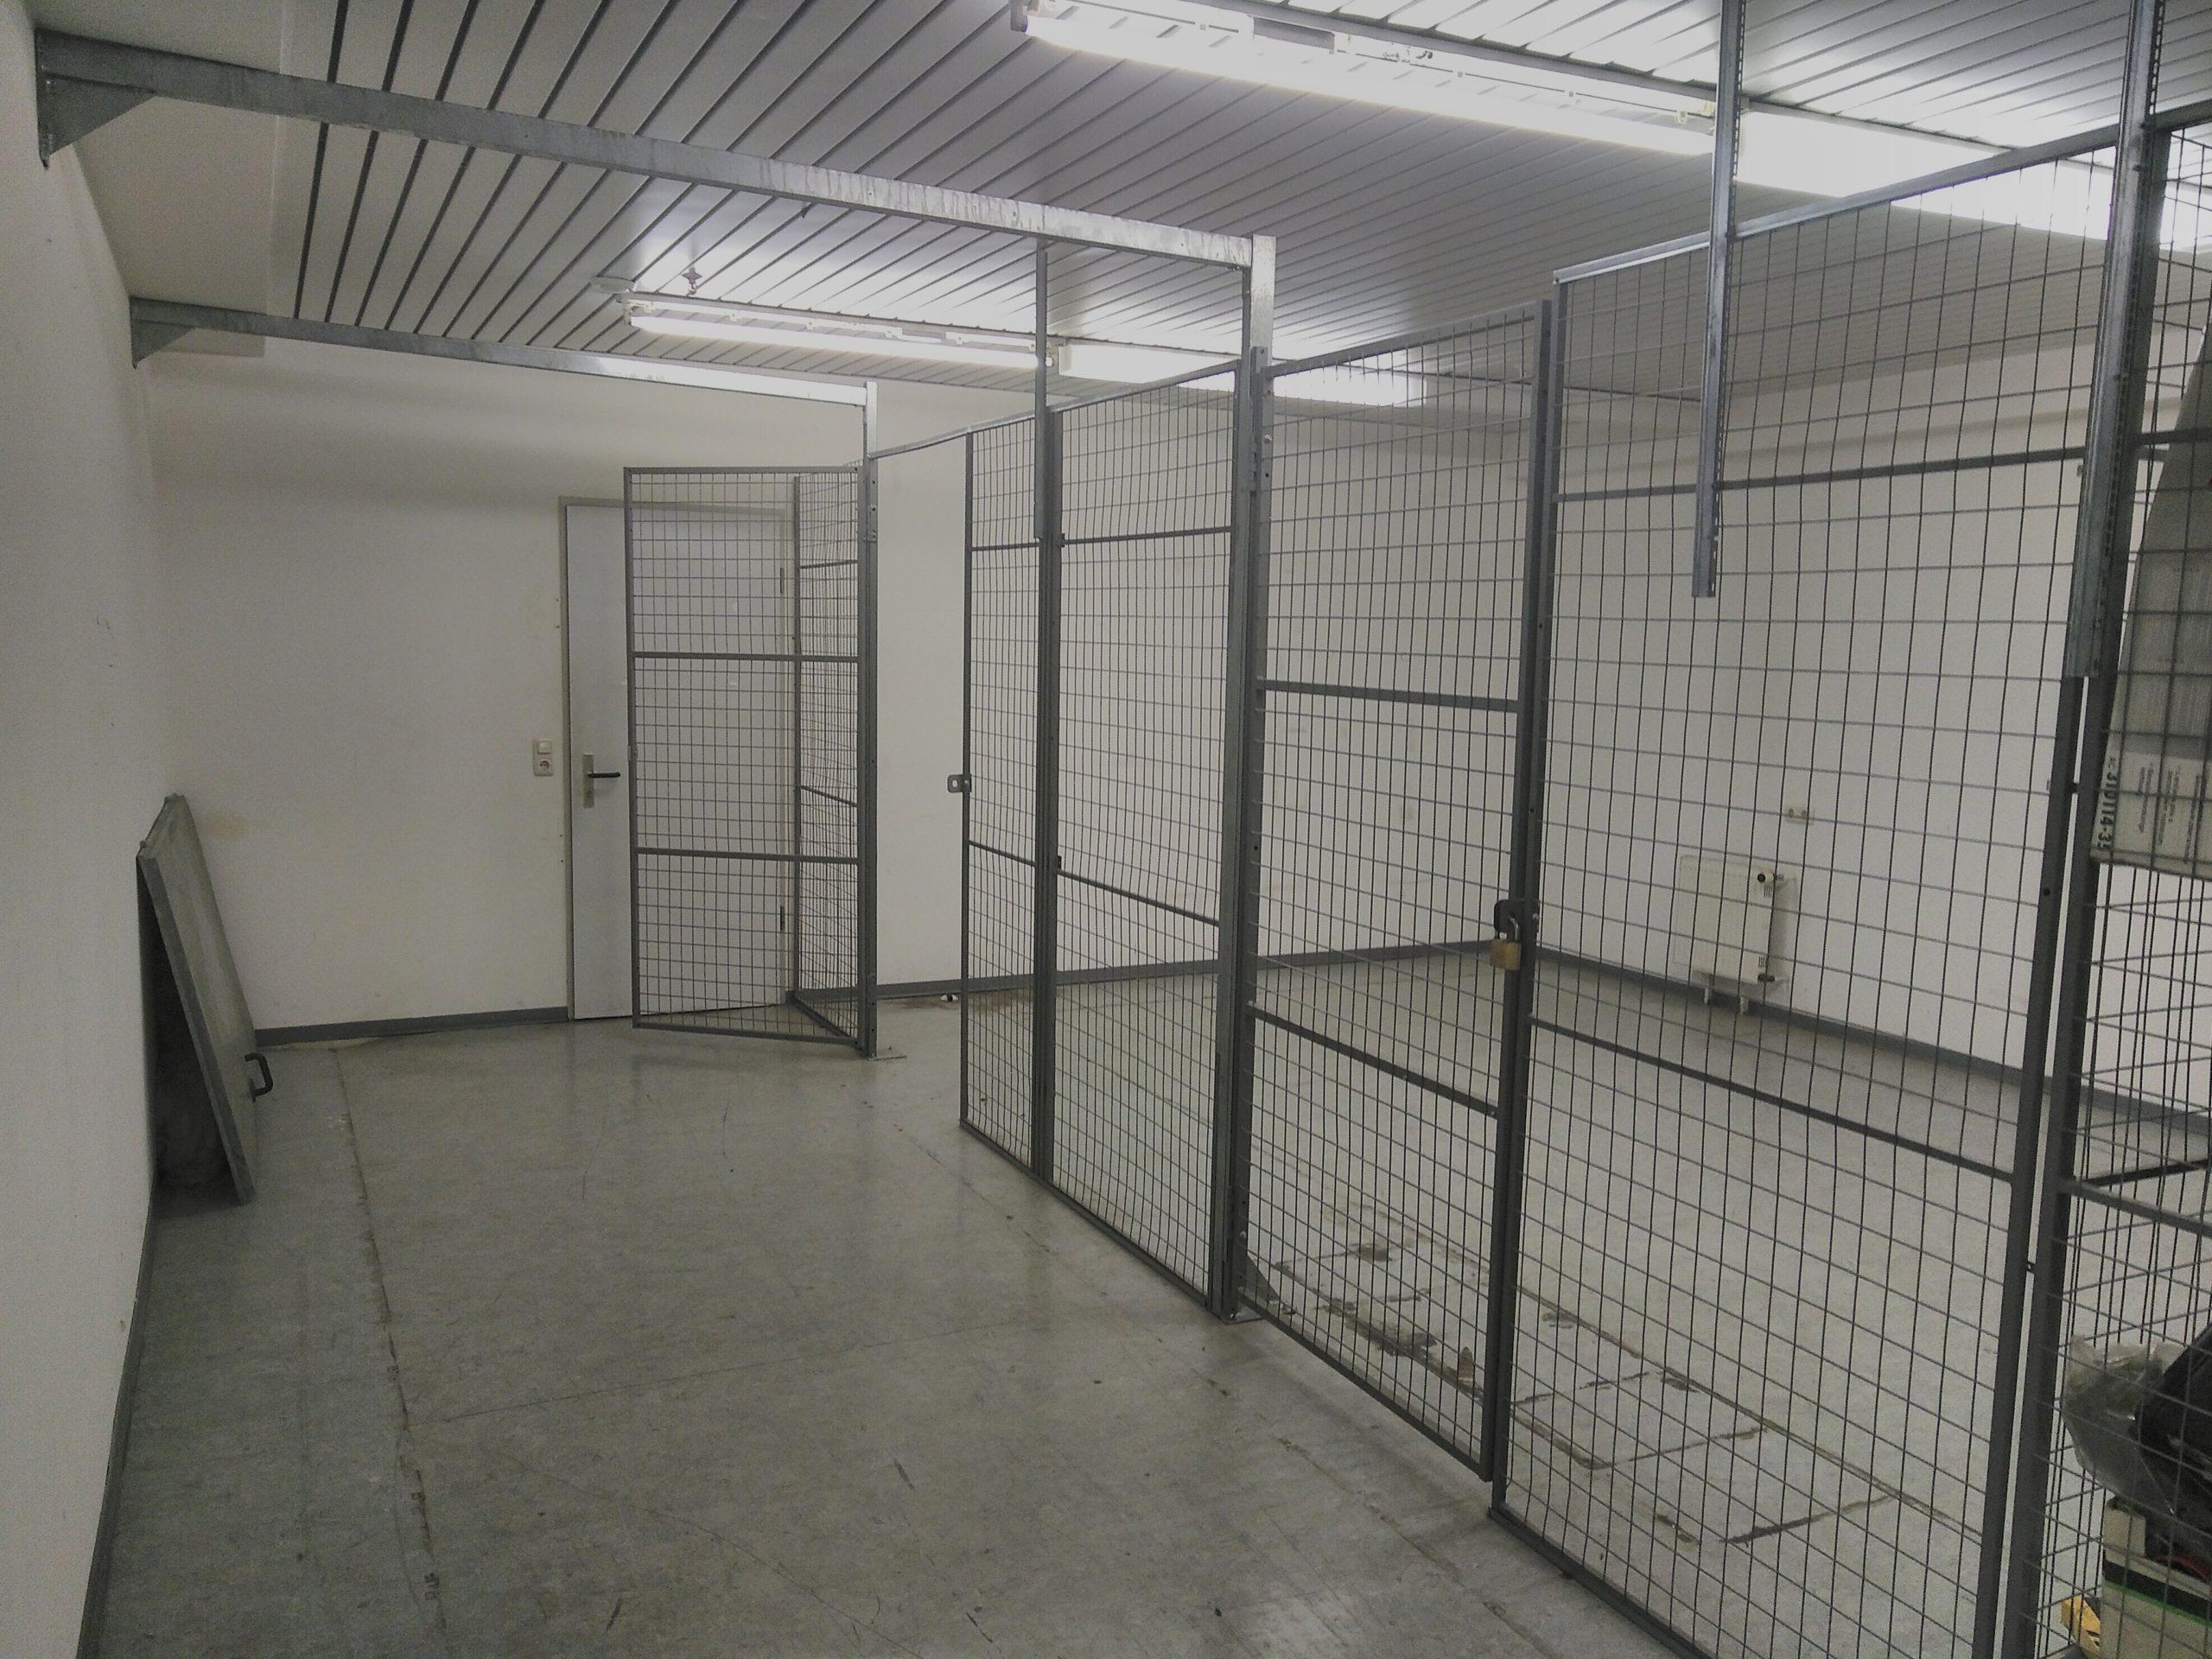 Proberäume & Studios bei Boxen Max mieten